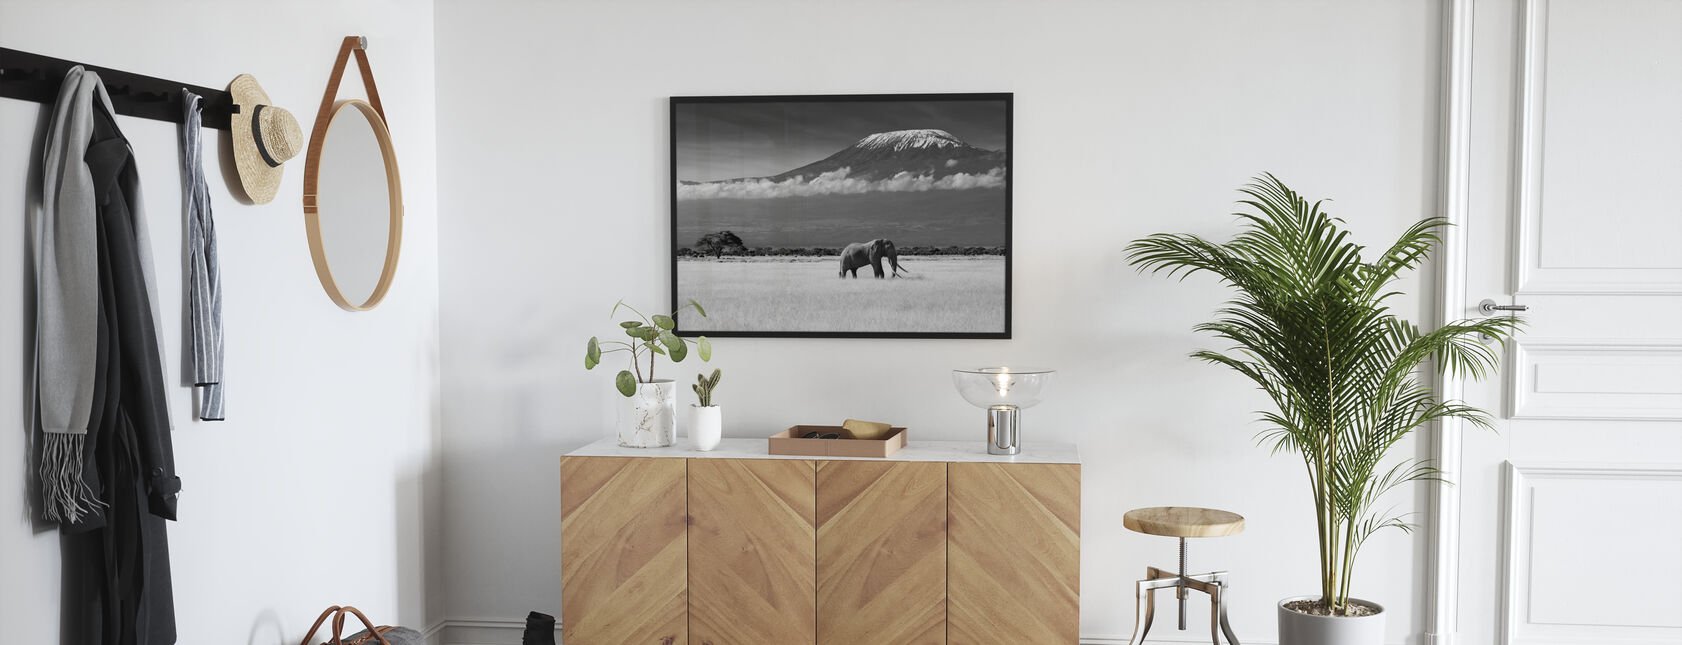 Elephant Landscape - Poster - Hallway